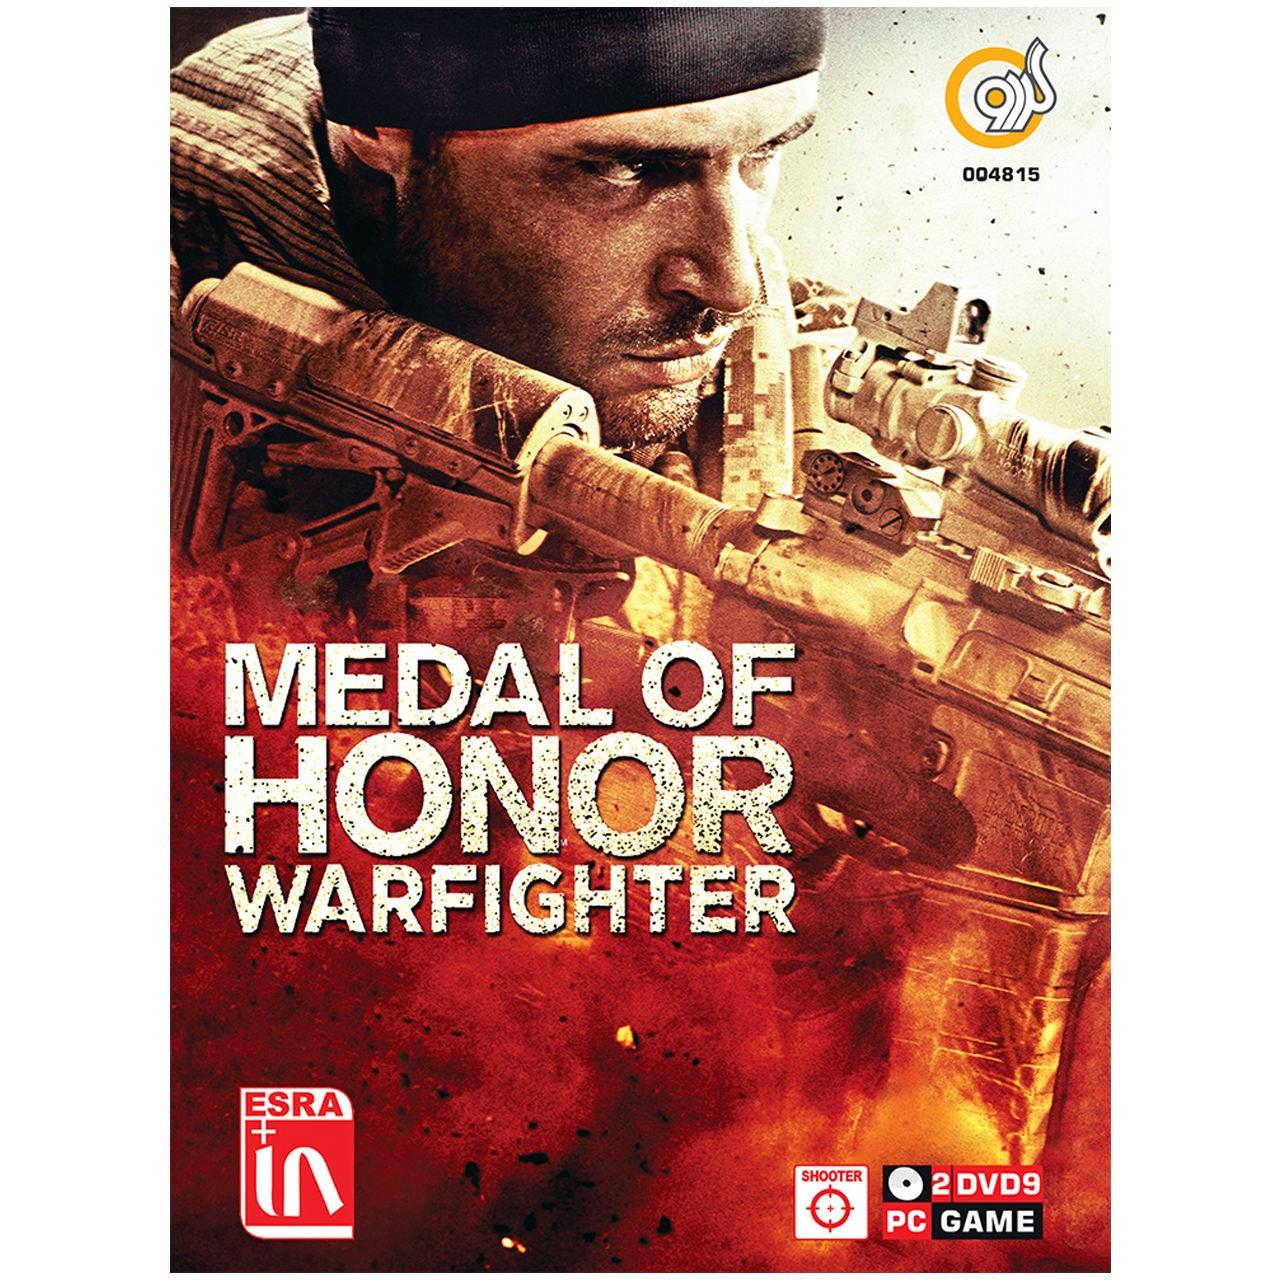 بازی گردو Medal of Honor Warfighter مخصوص PC